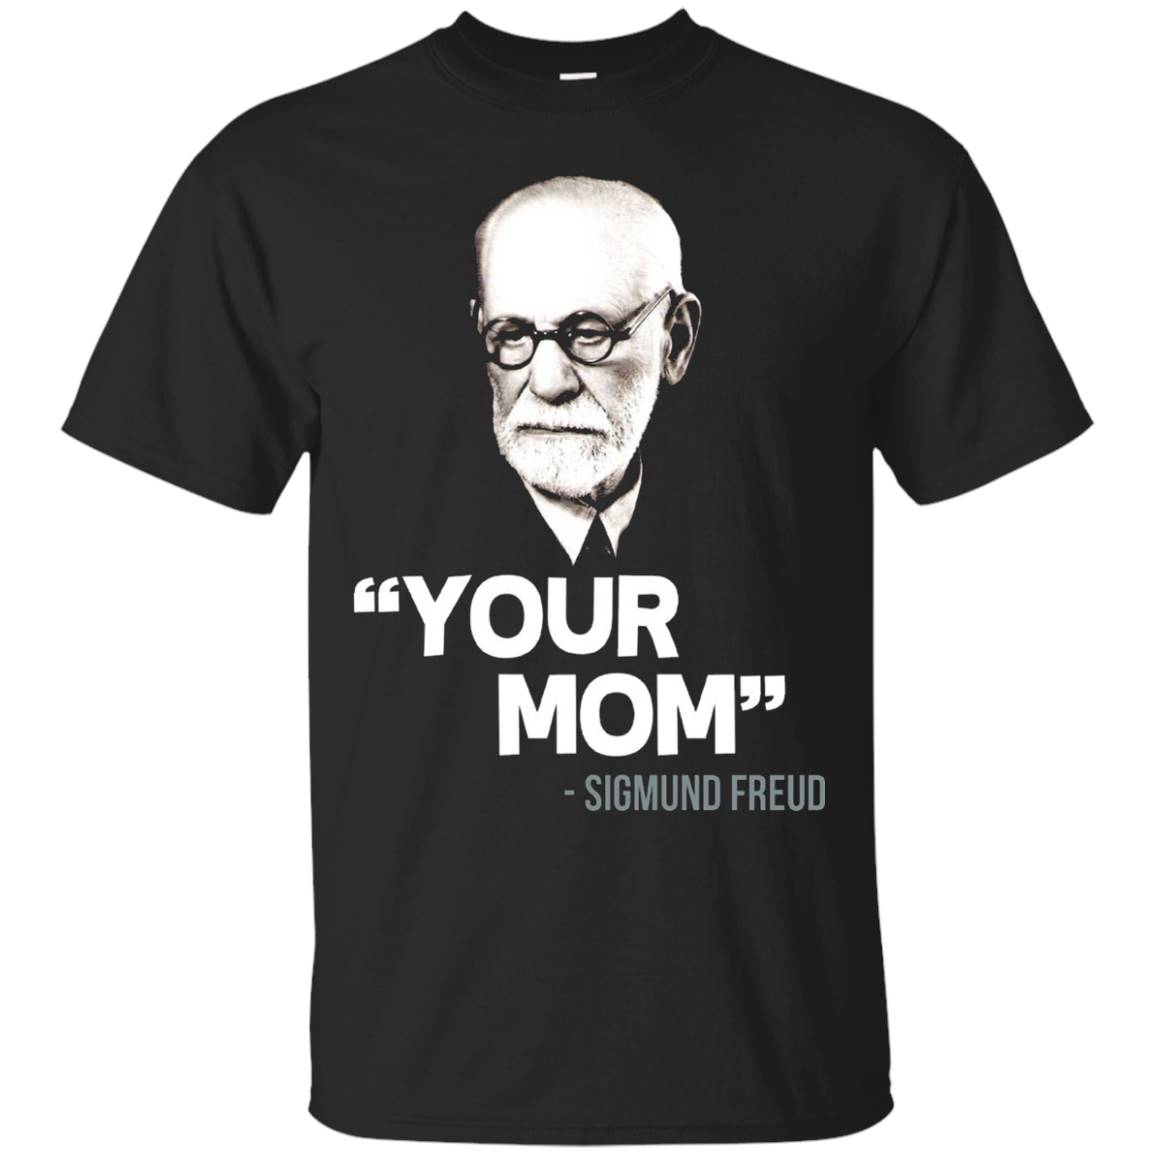 """Your mom."" – Sigmund Freud. Funny Freud Quote on T-Shirt"